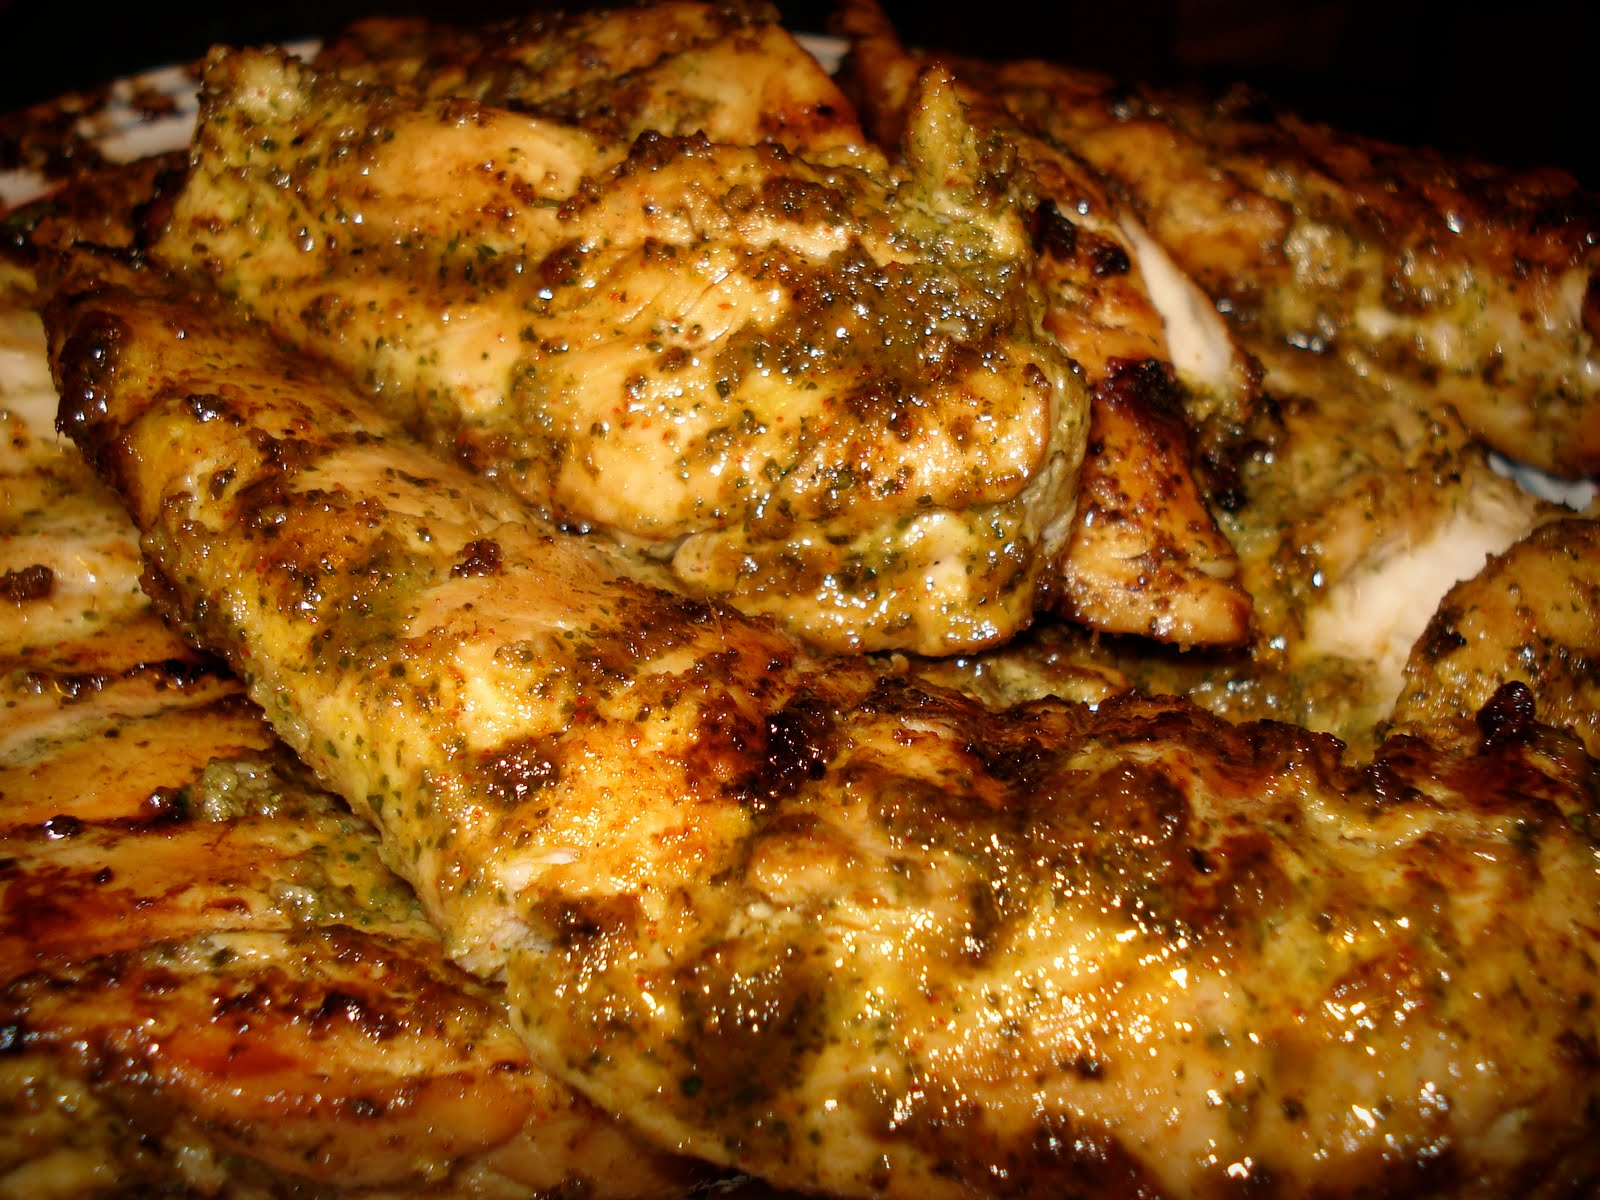 lindstew foodies : :: Grilled Cilantro Lime Pork Chops or Chicken